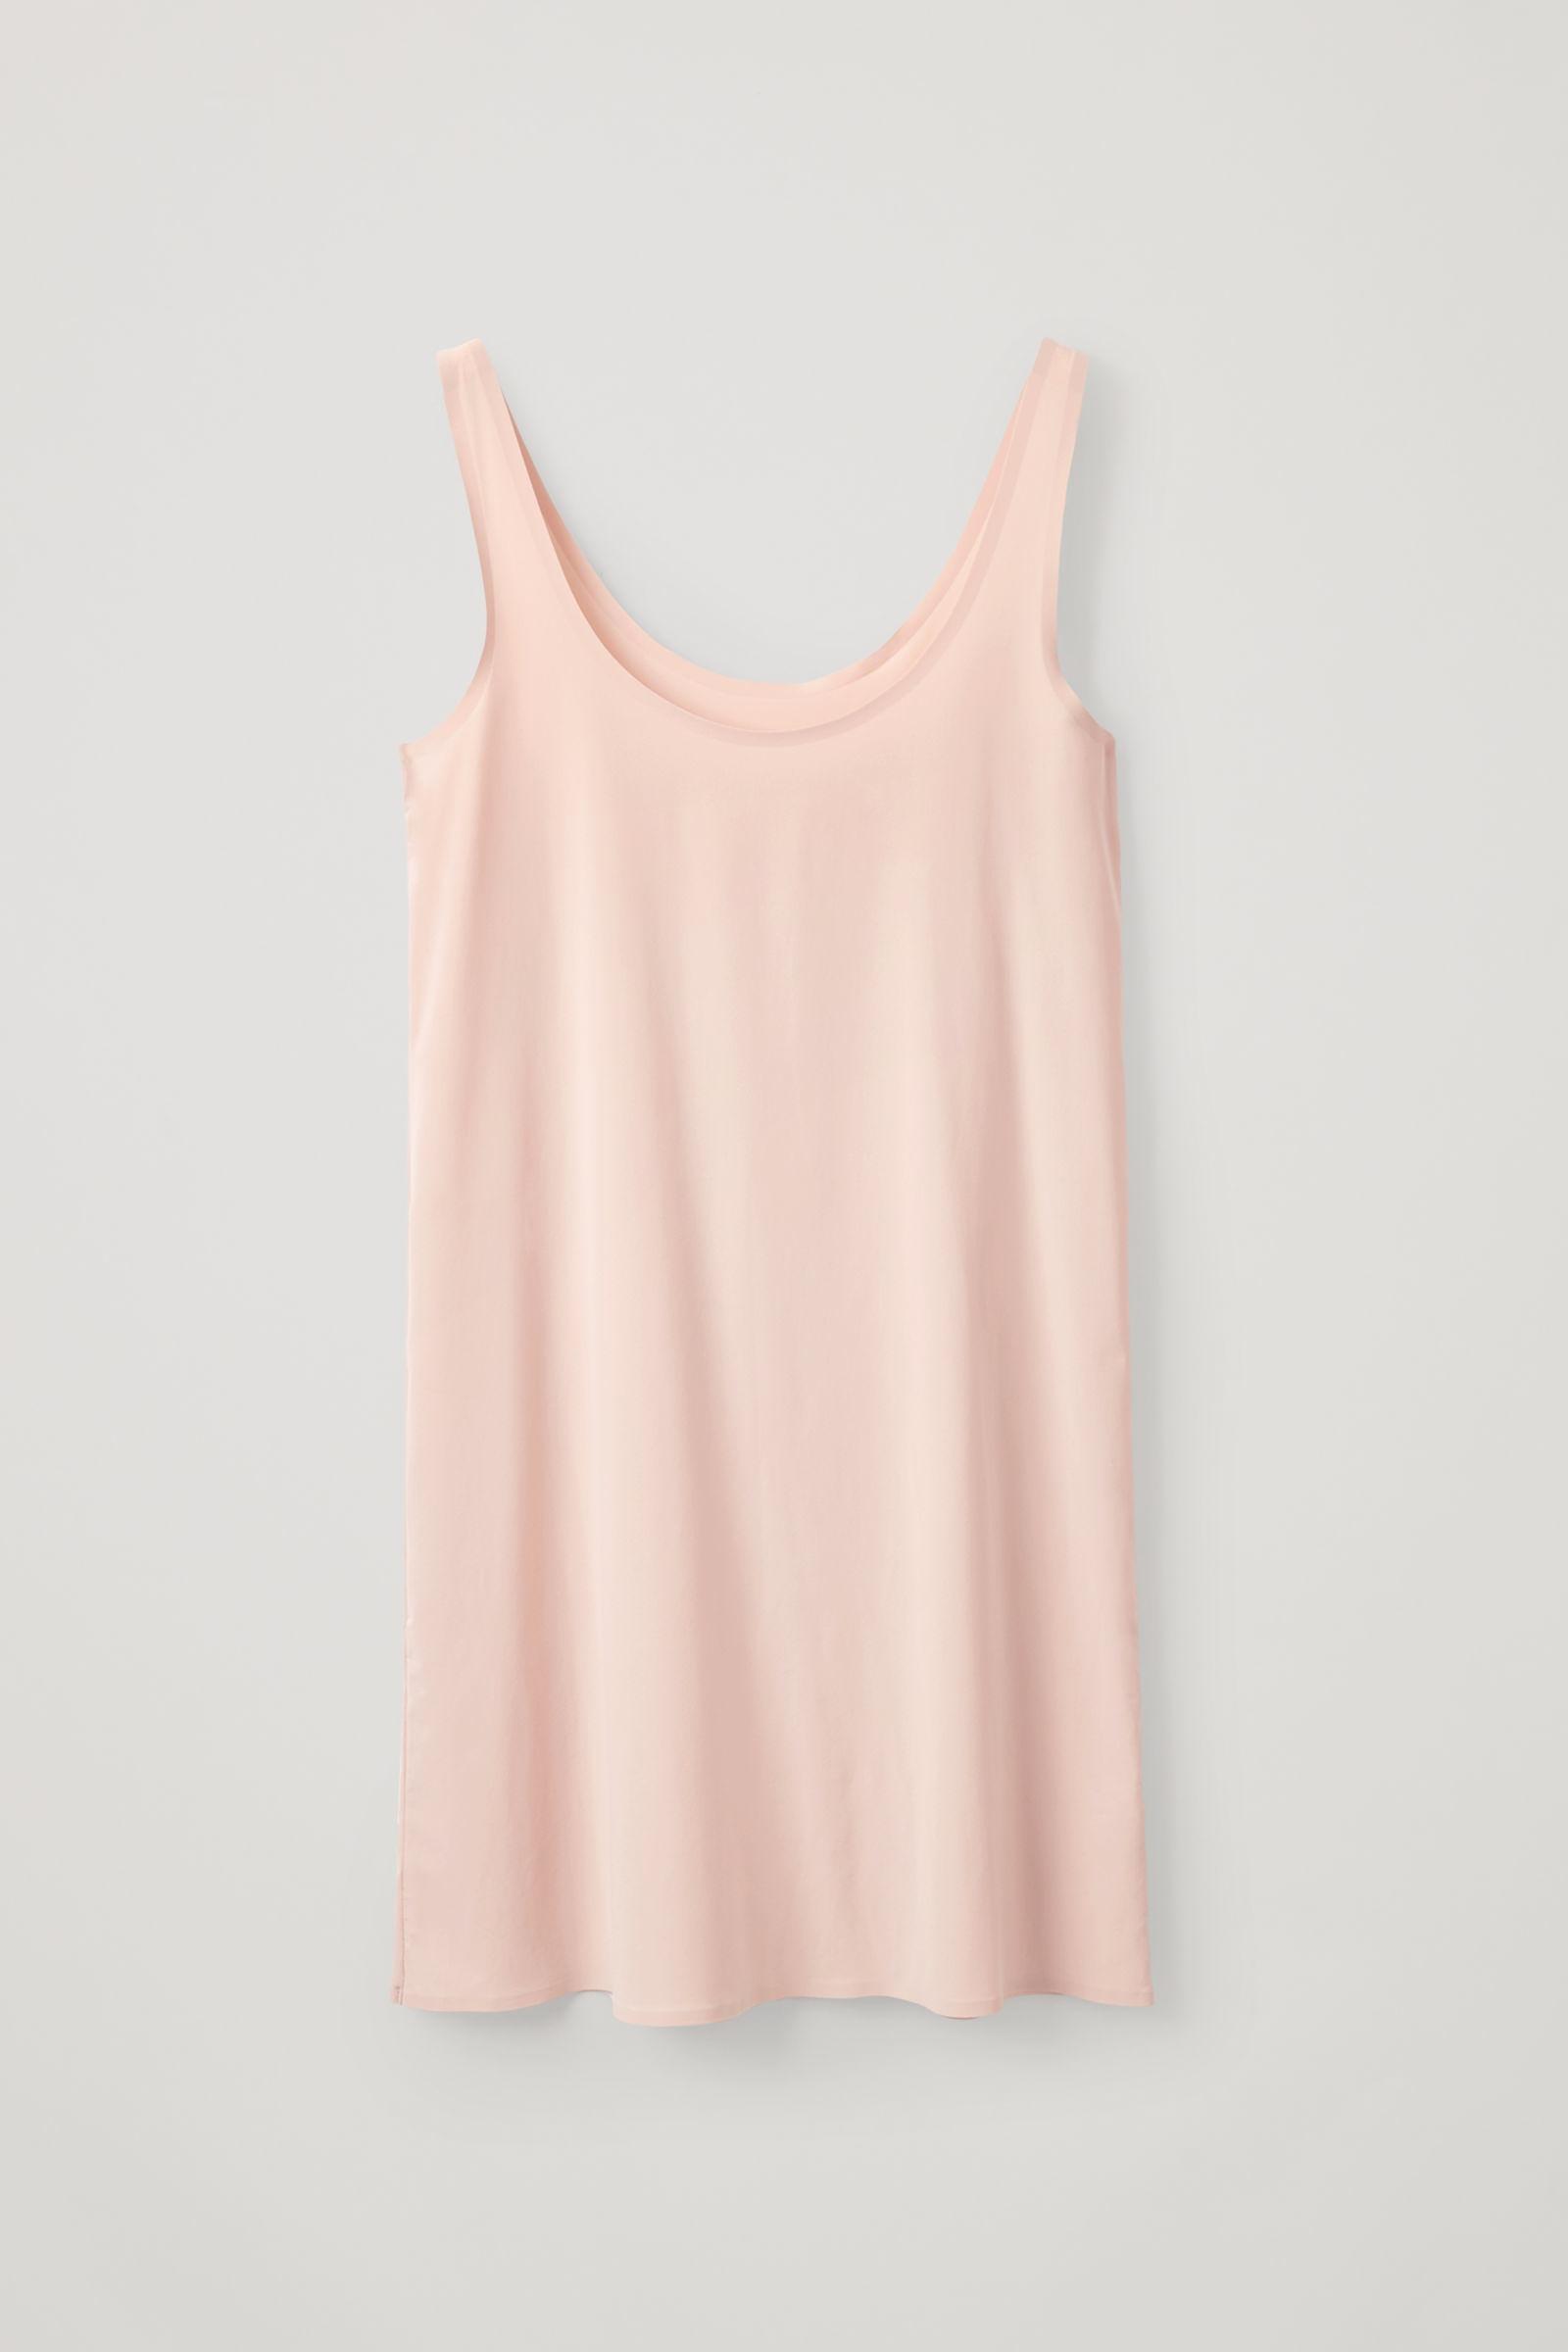 COS 심리스 슬립 드레스 의 베이지컬러 Product입니다.